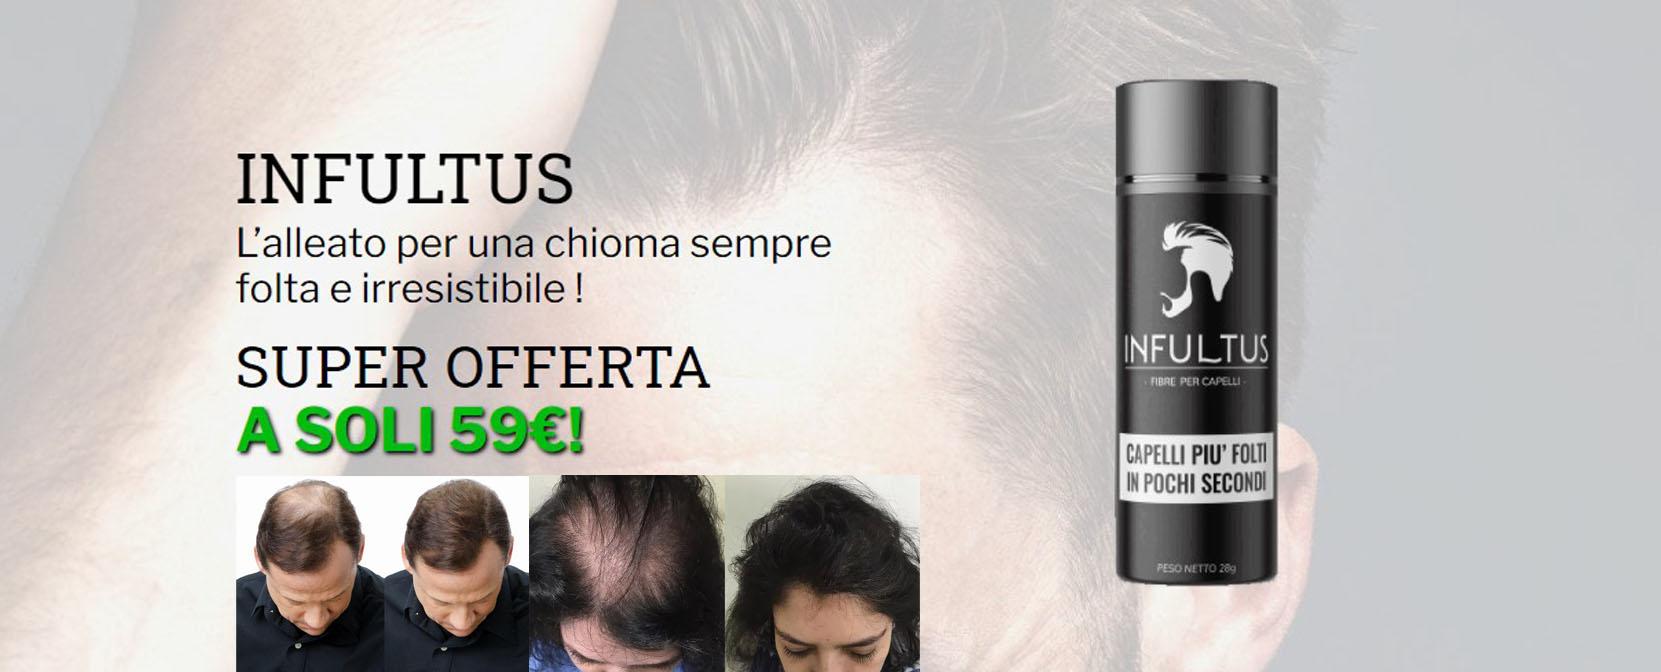 infultus capelli cheratina